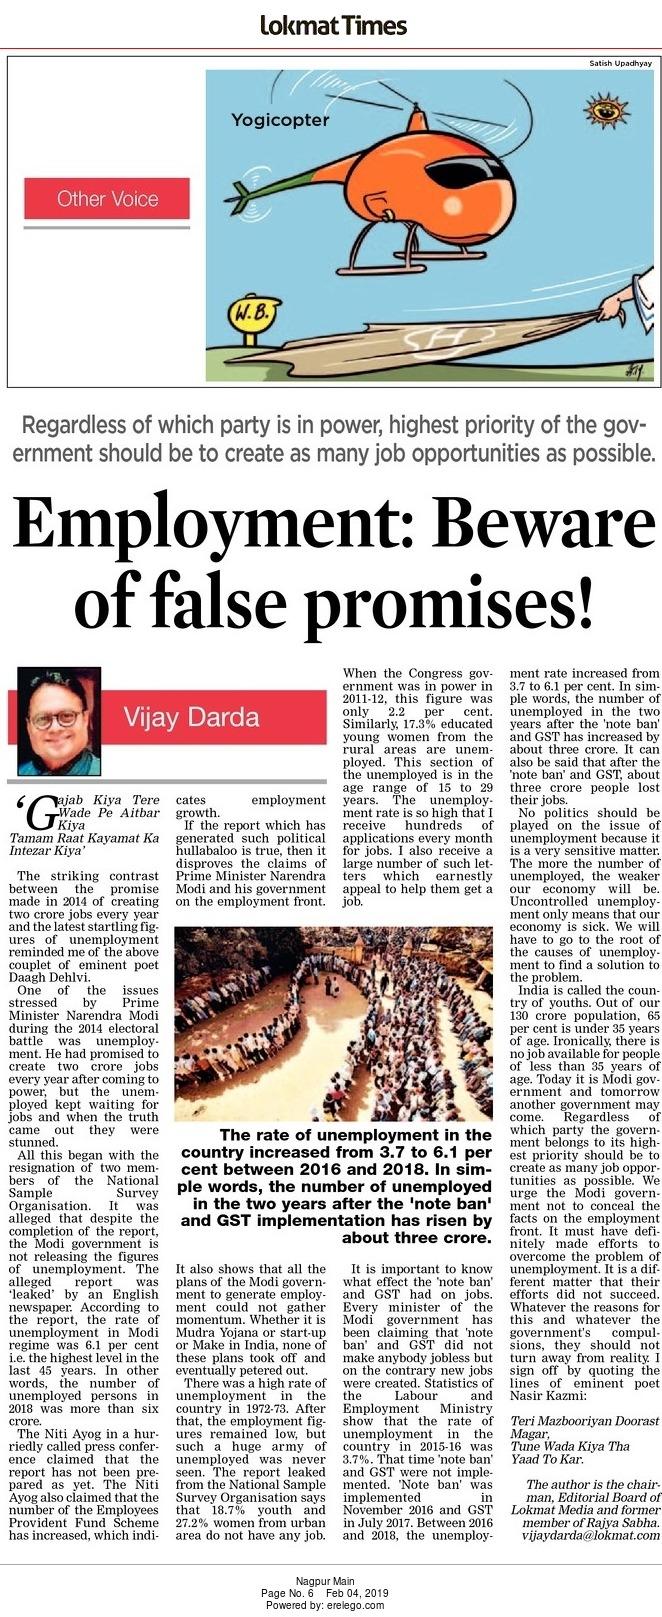 Employment: Beware of false promises!